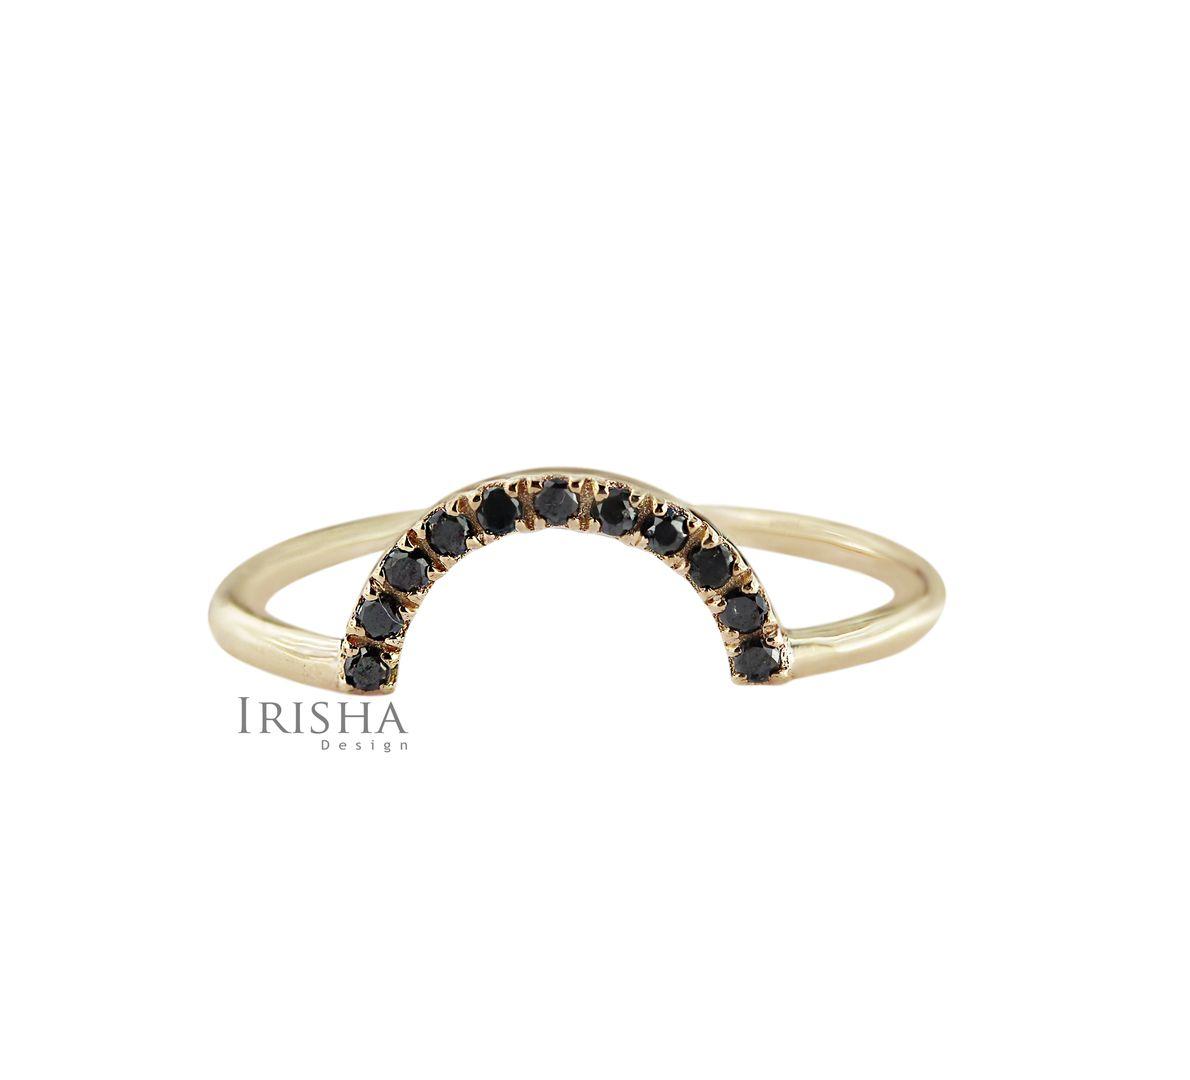 14K Gold 0.08 Ct. Genuine Black Diamond Half Moon Design Ring Fine Jewelry